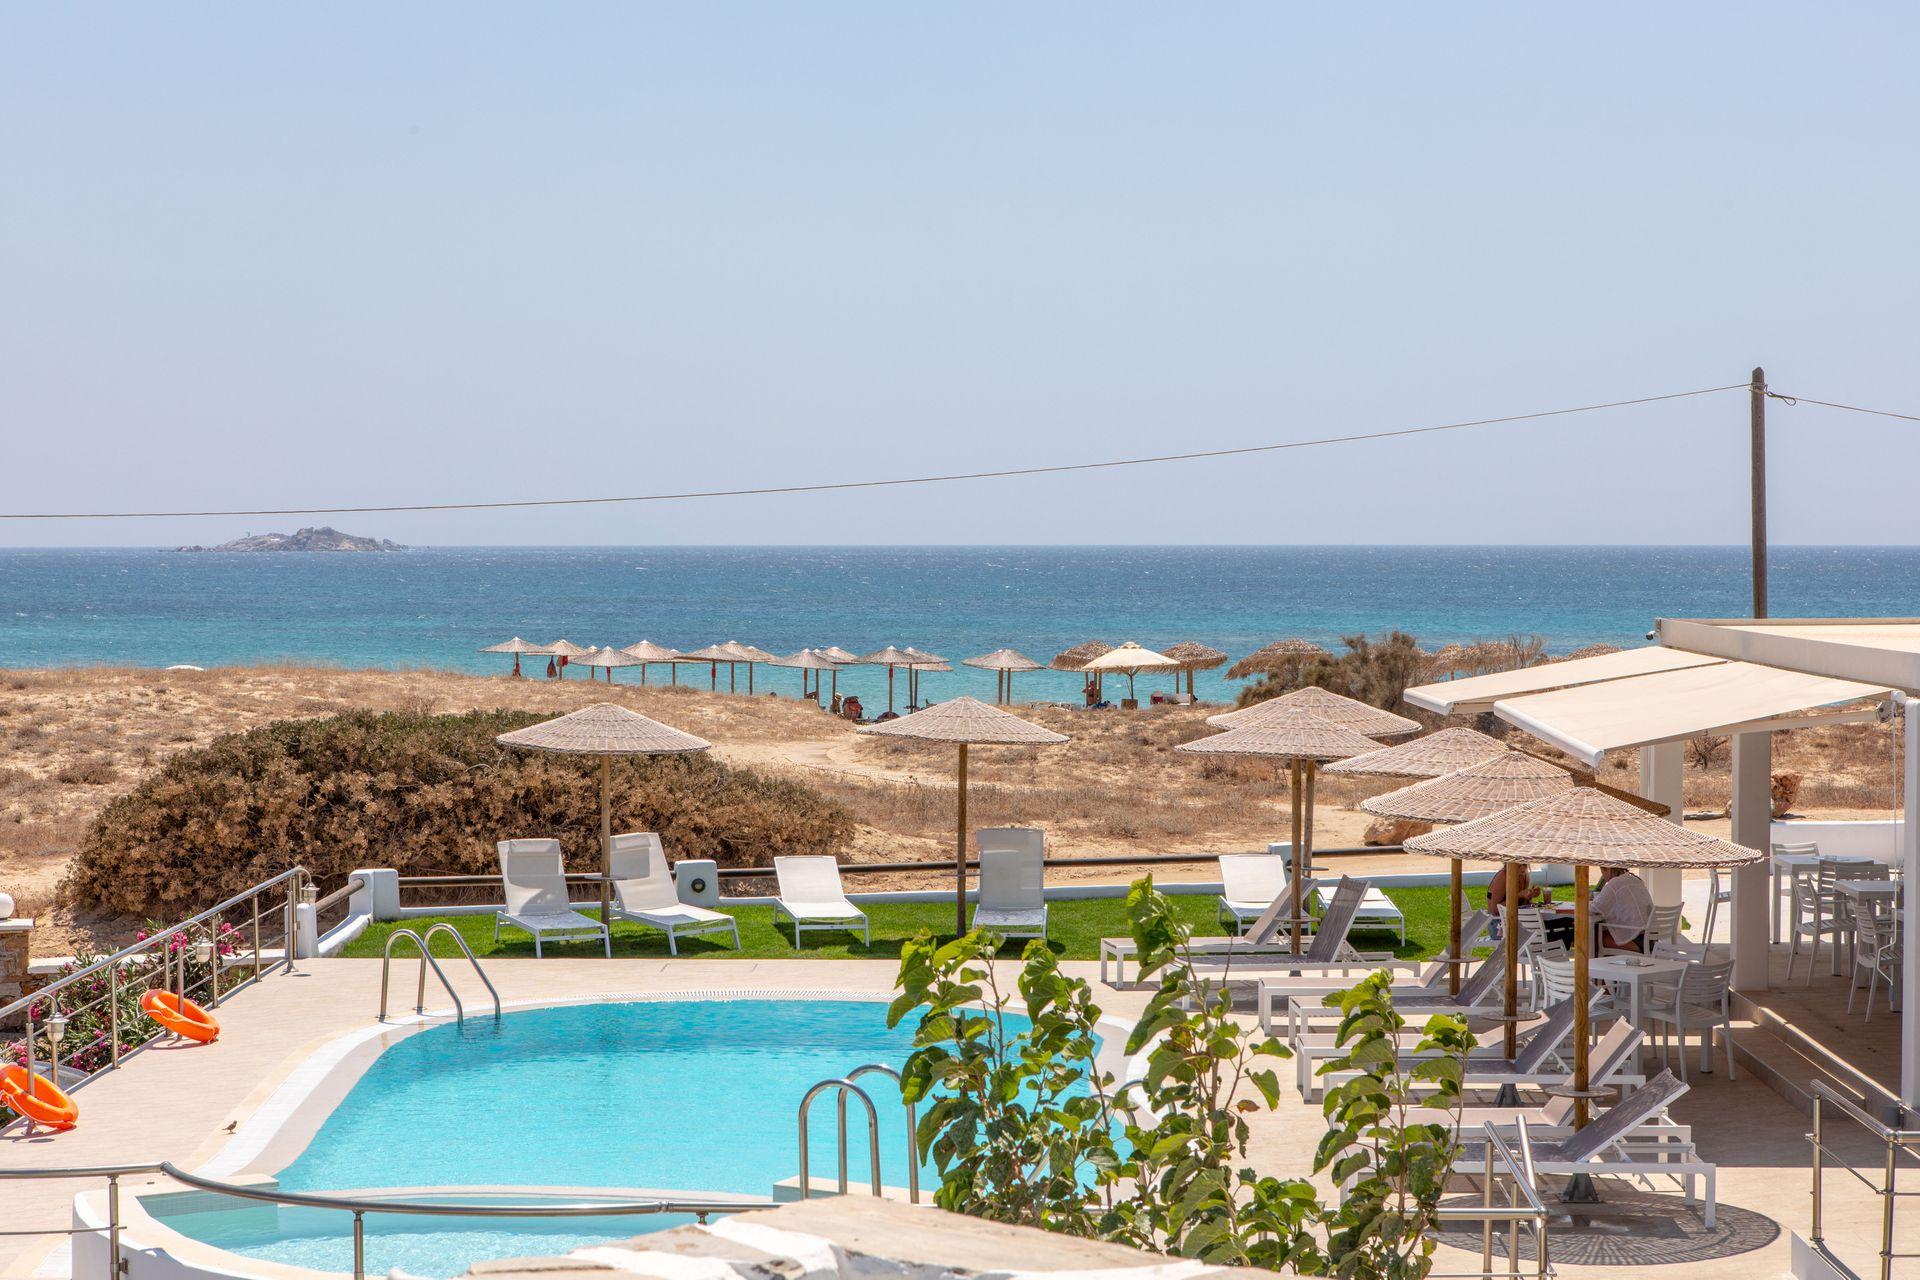 Golden Sand - Νάξος ✦ -15% ✦ 4 Ημέρες (3 Διανυκτερεύσεις) ✦ 2 άτομα ✦ Πρωινό ✦ 01/07/2021 έως 31/08/2021 ✦ Μπροστά στην παραλία!